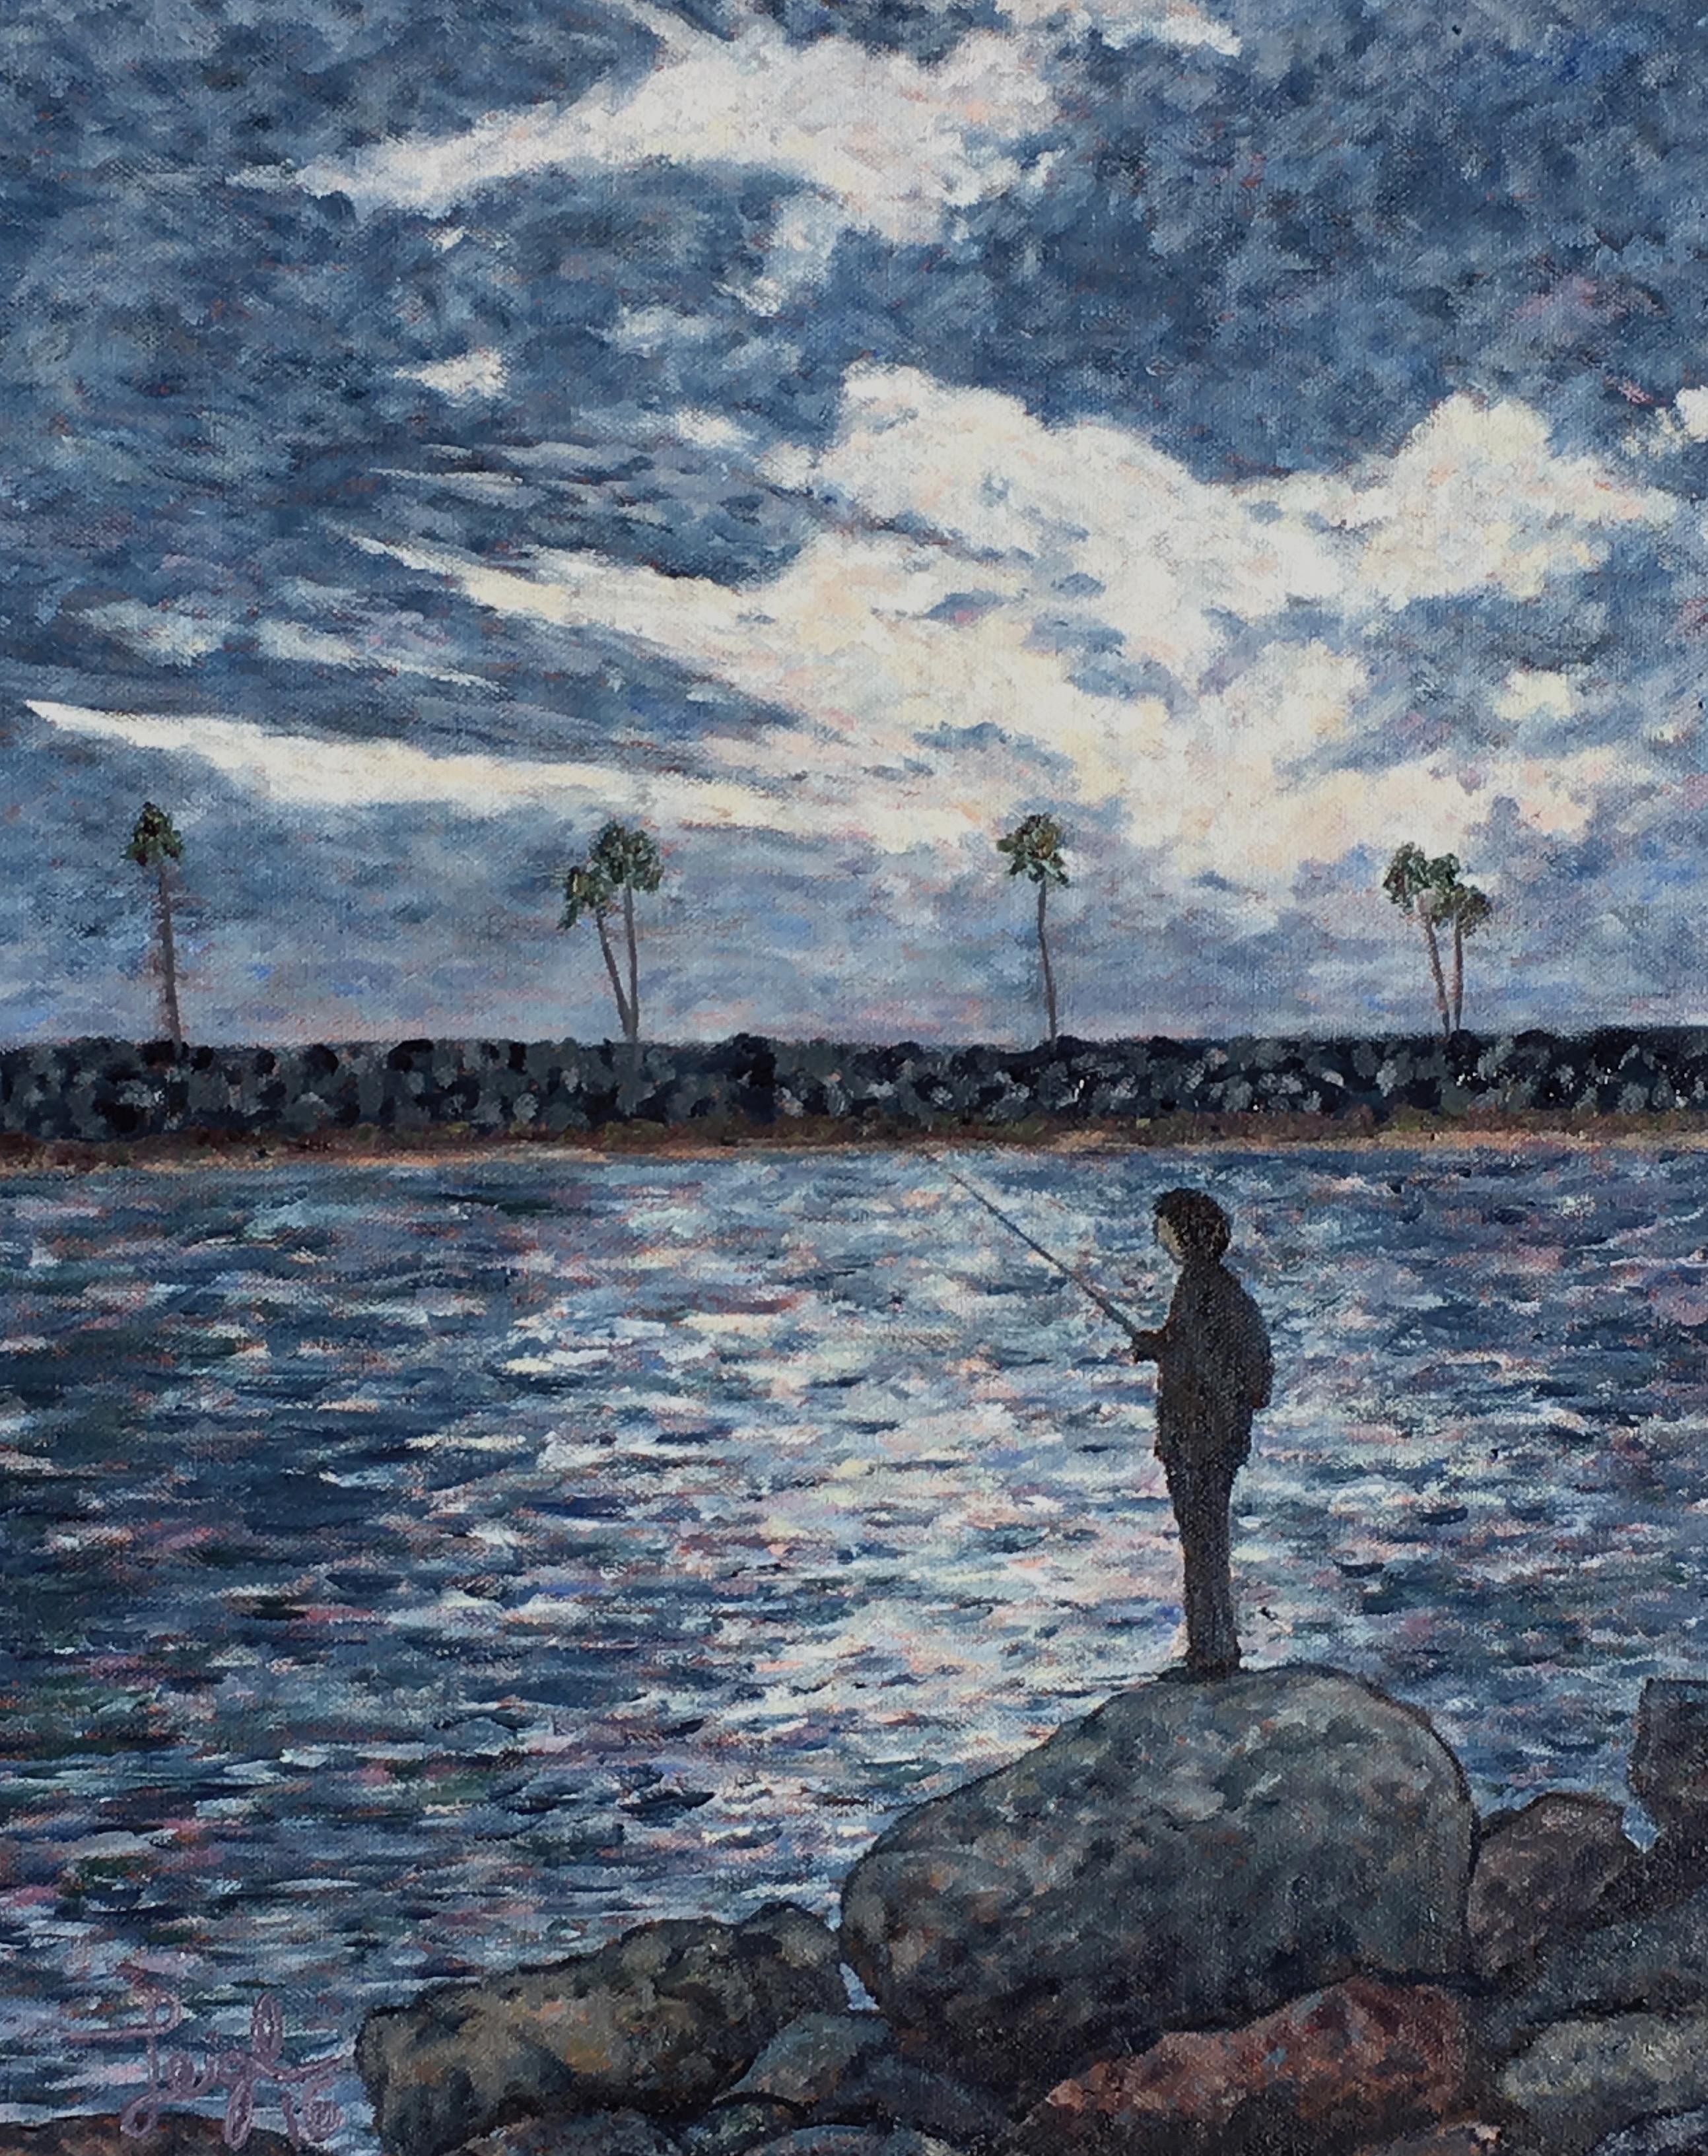 Fishing at Dusk  ~   Mikey Contardi, Vista, CA 2016  •  16 x 20